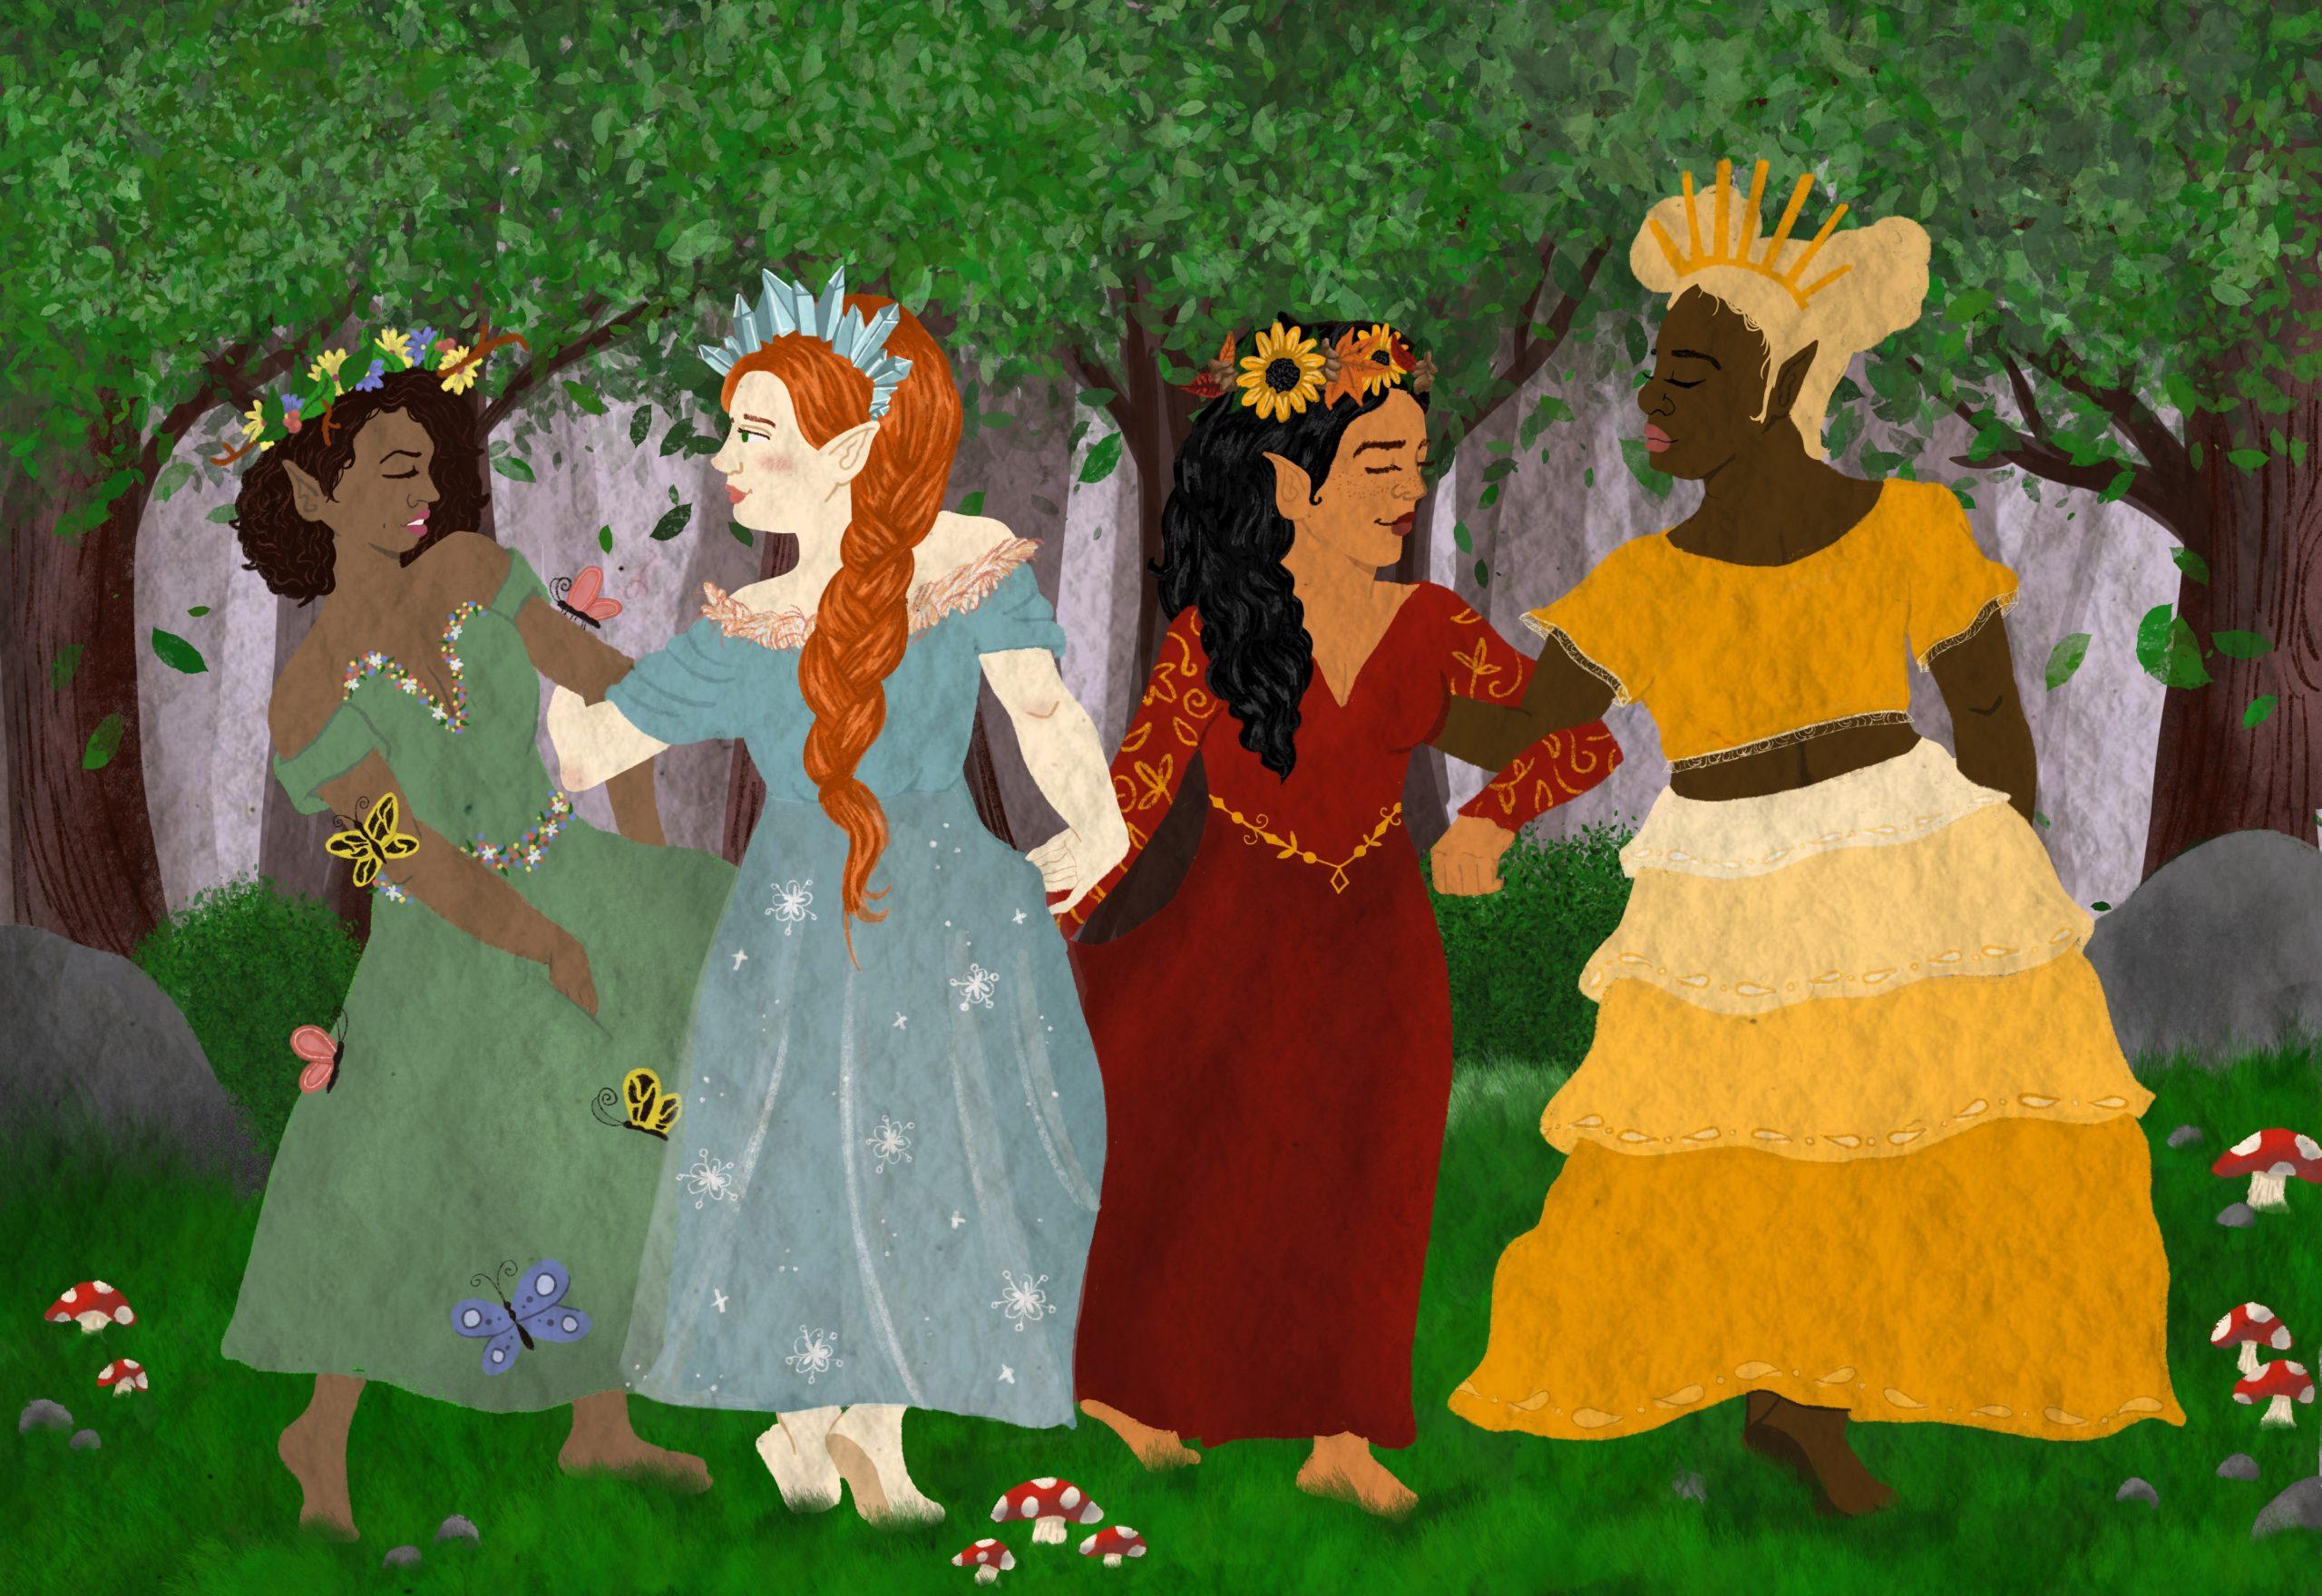 Vivaldi Four Seasons student artwork from MassArt, Katiana Rodriguez